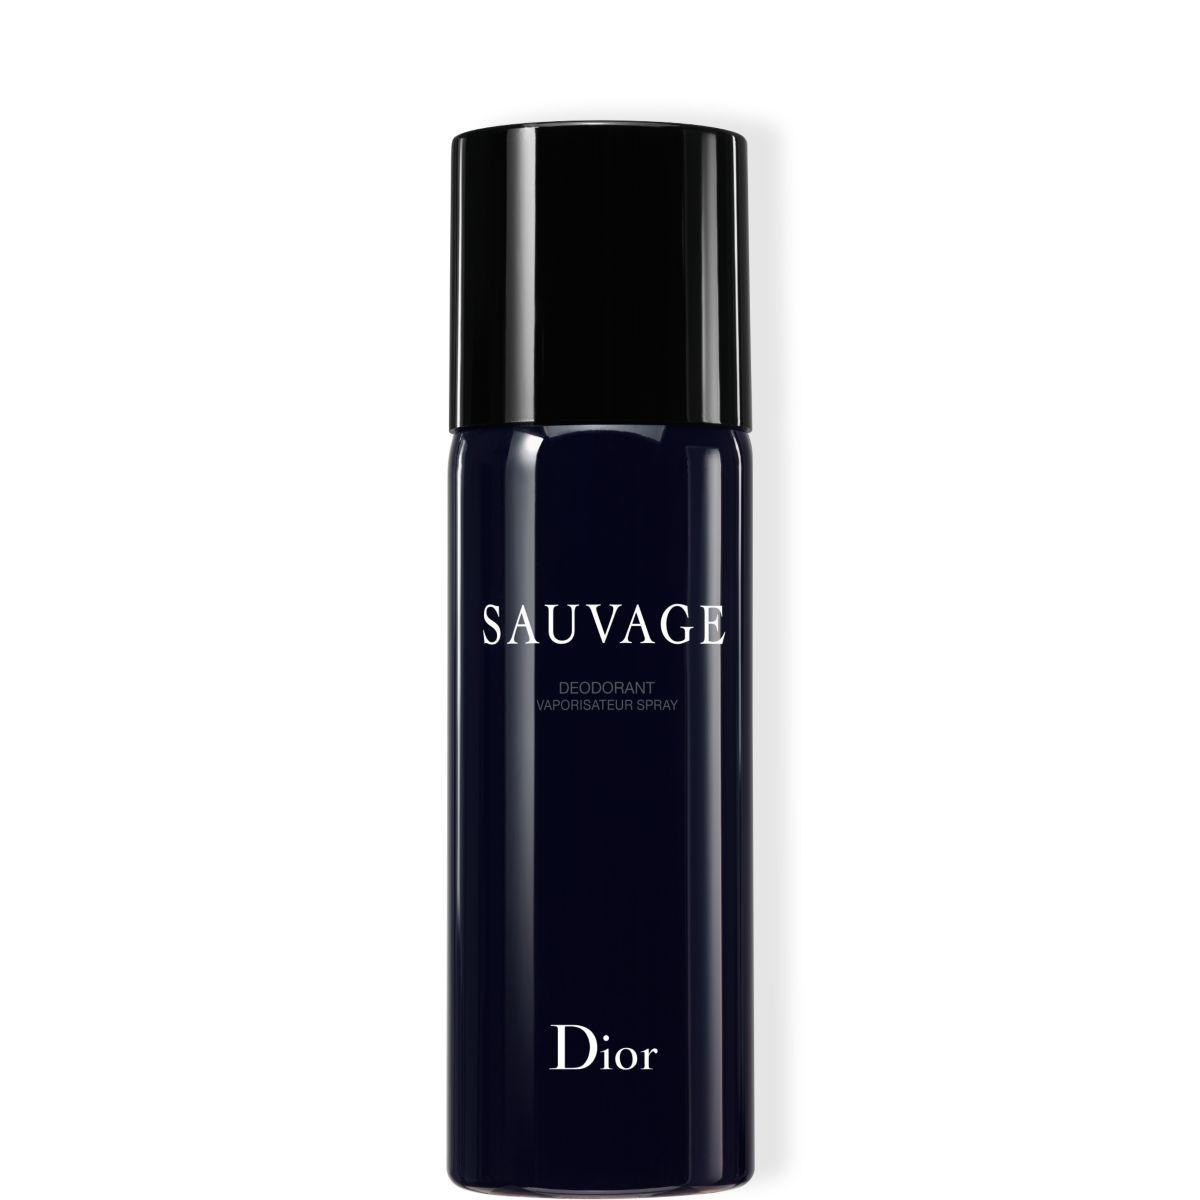 Dior - Sauvage - Déodorant Vaporisateur